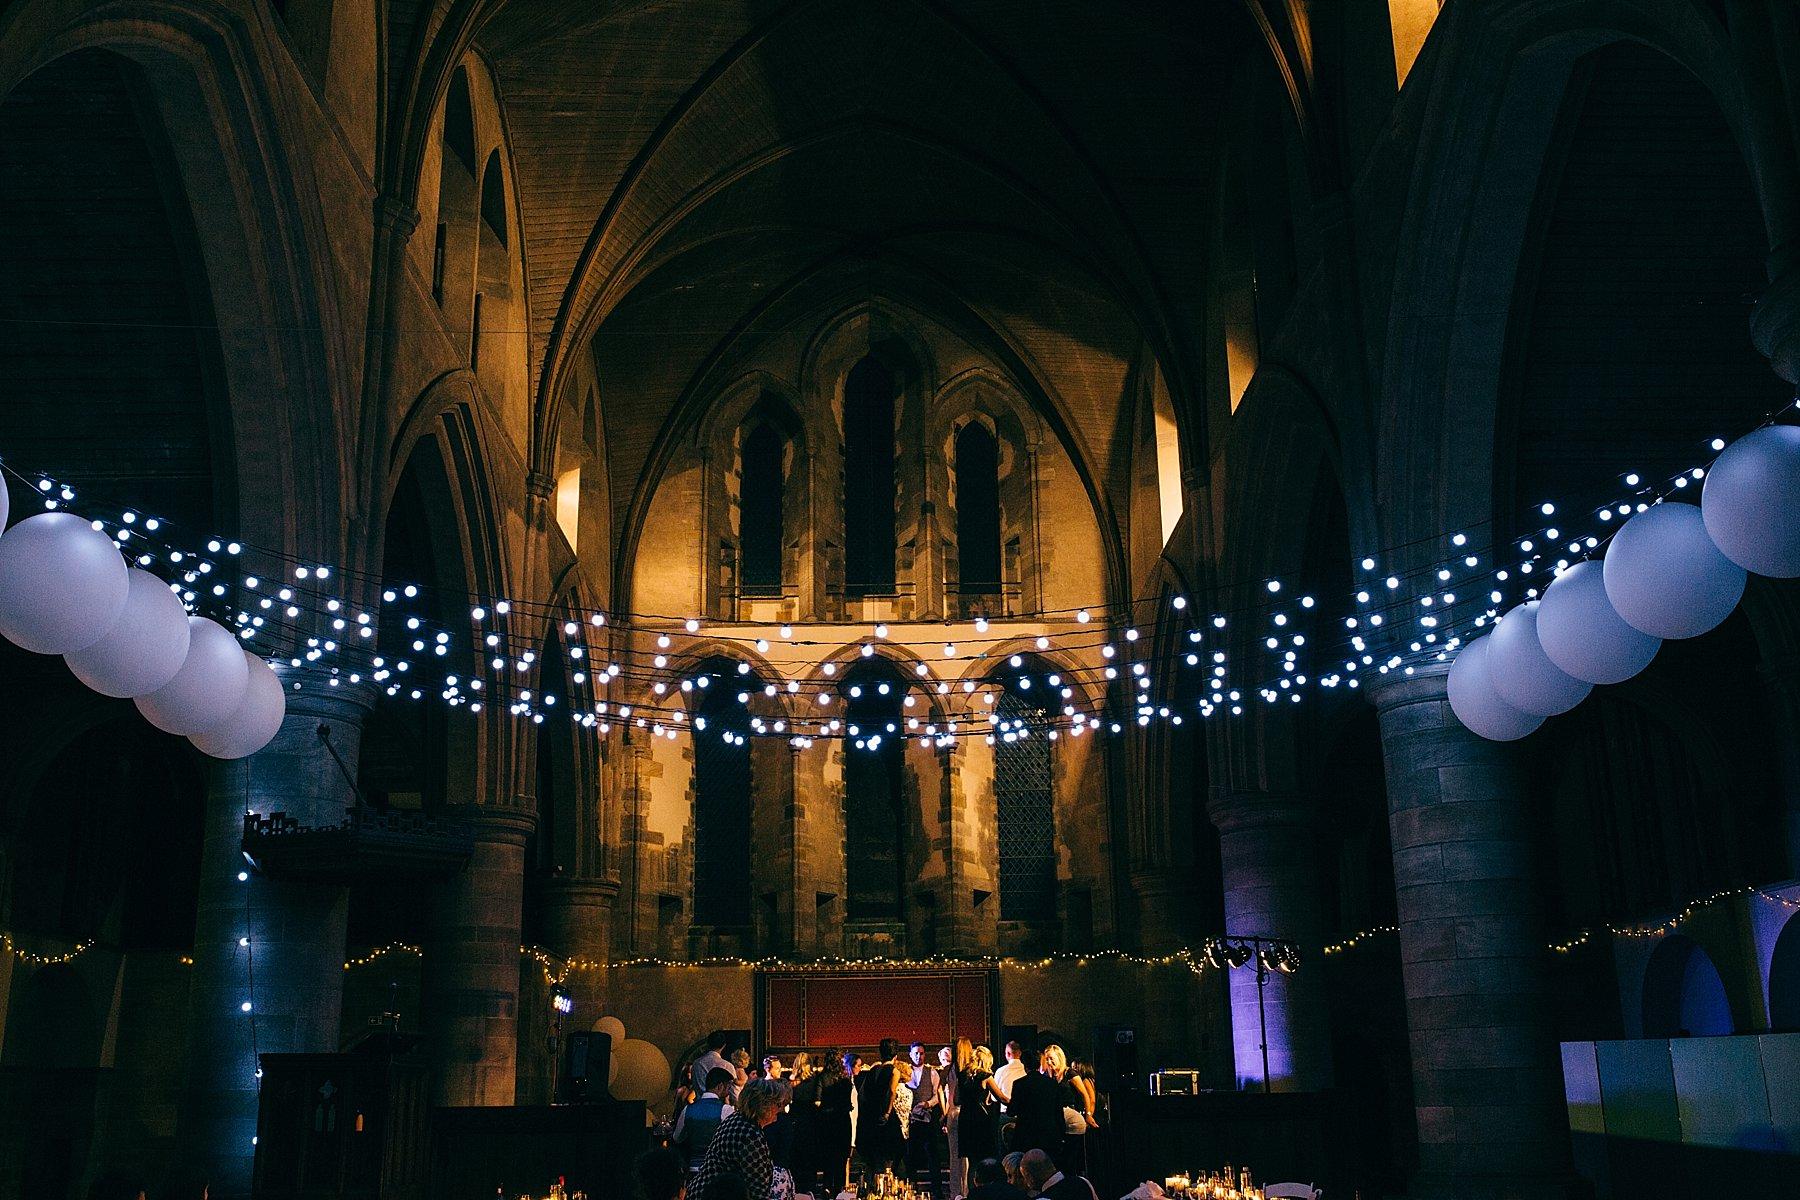 CV-799_Left-Bank-Leeds-alternative-documentary-style-wedding-photographer.jpg